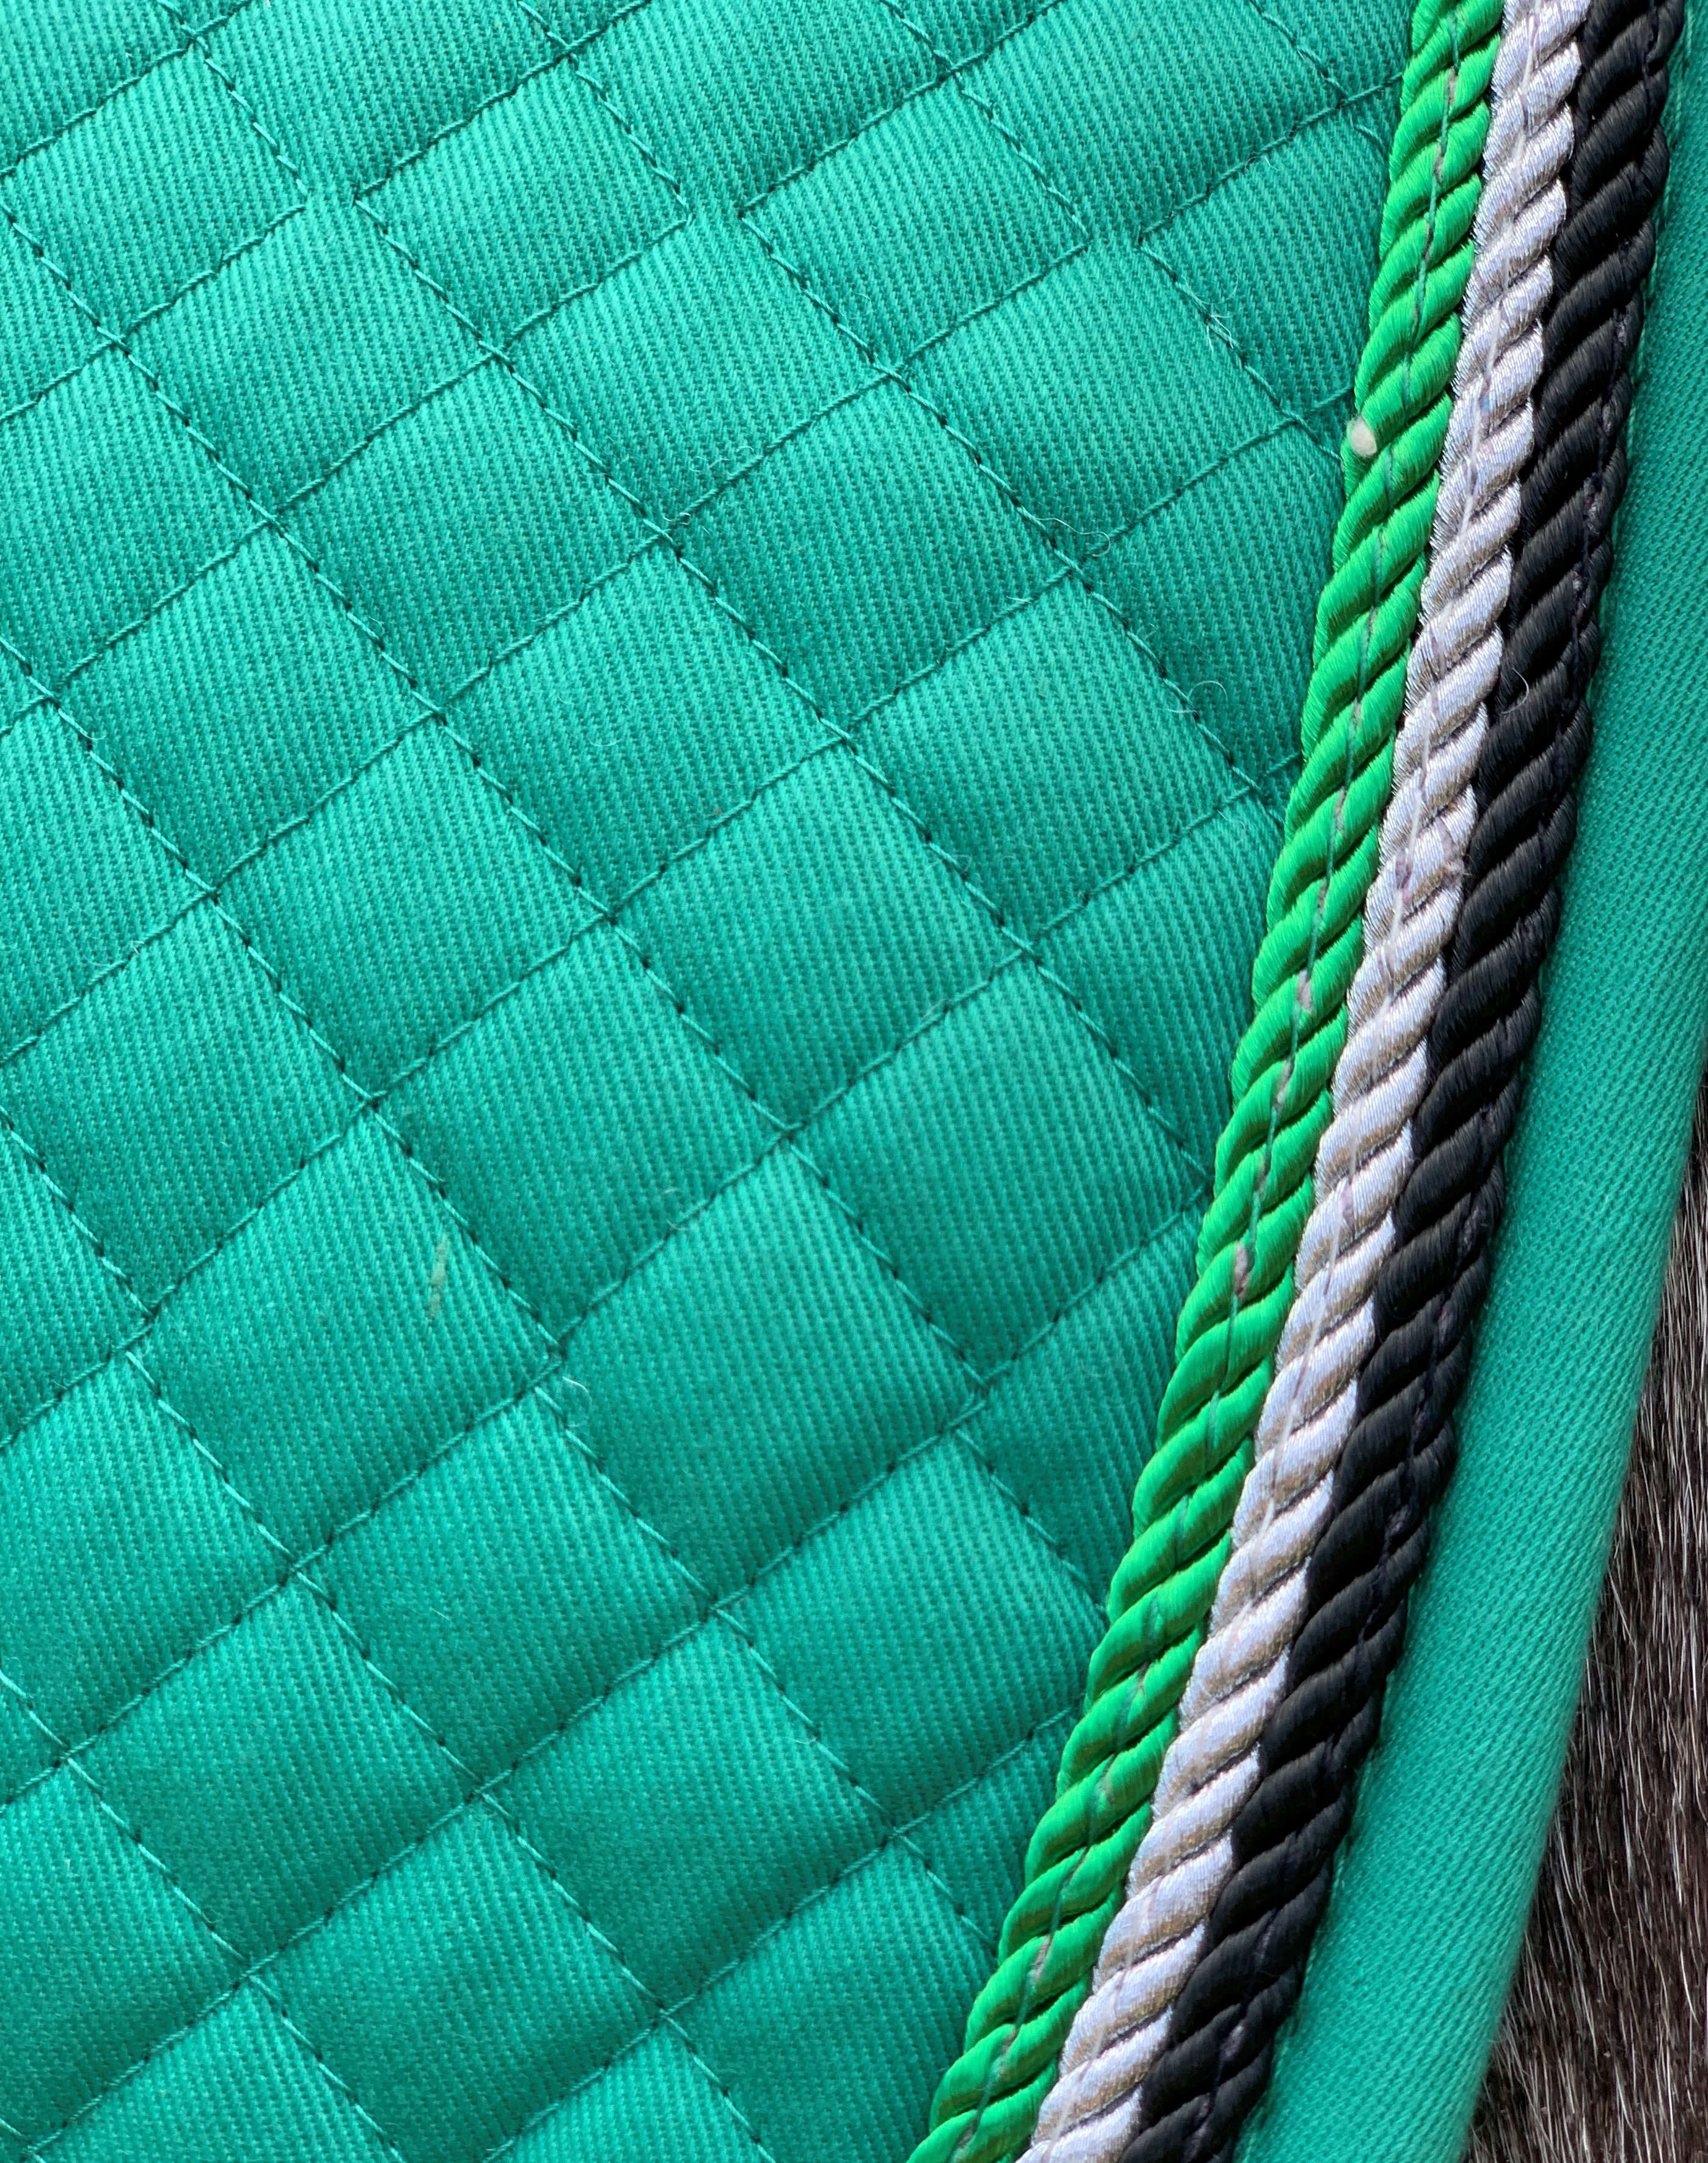 Valleyhorsewear Dressage Saddle Pad-Emerald Green